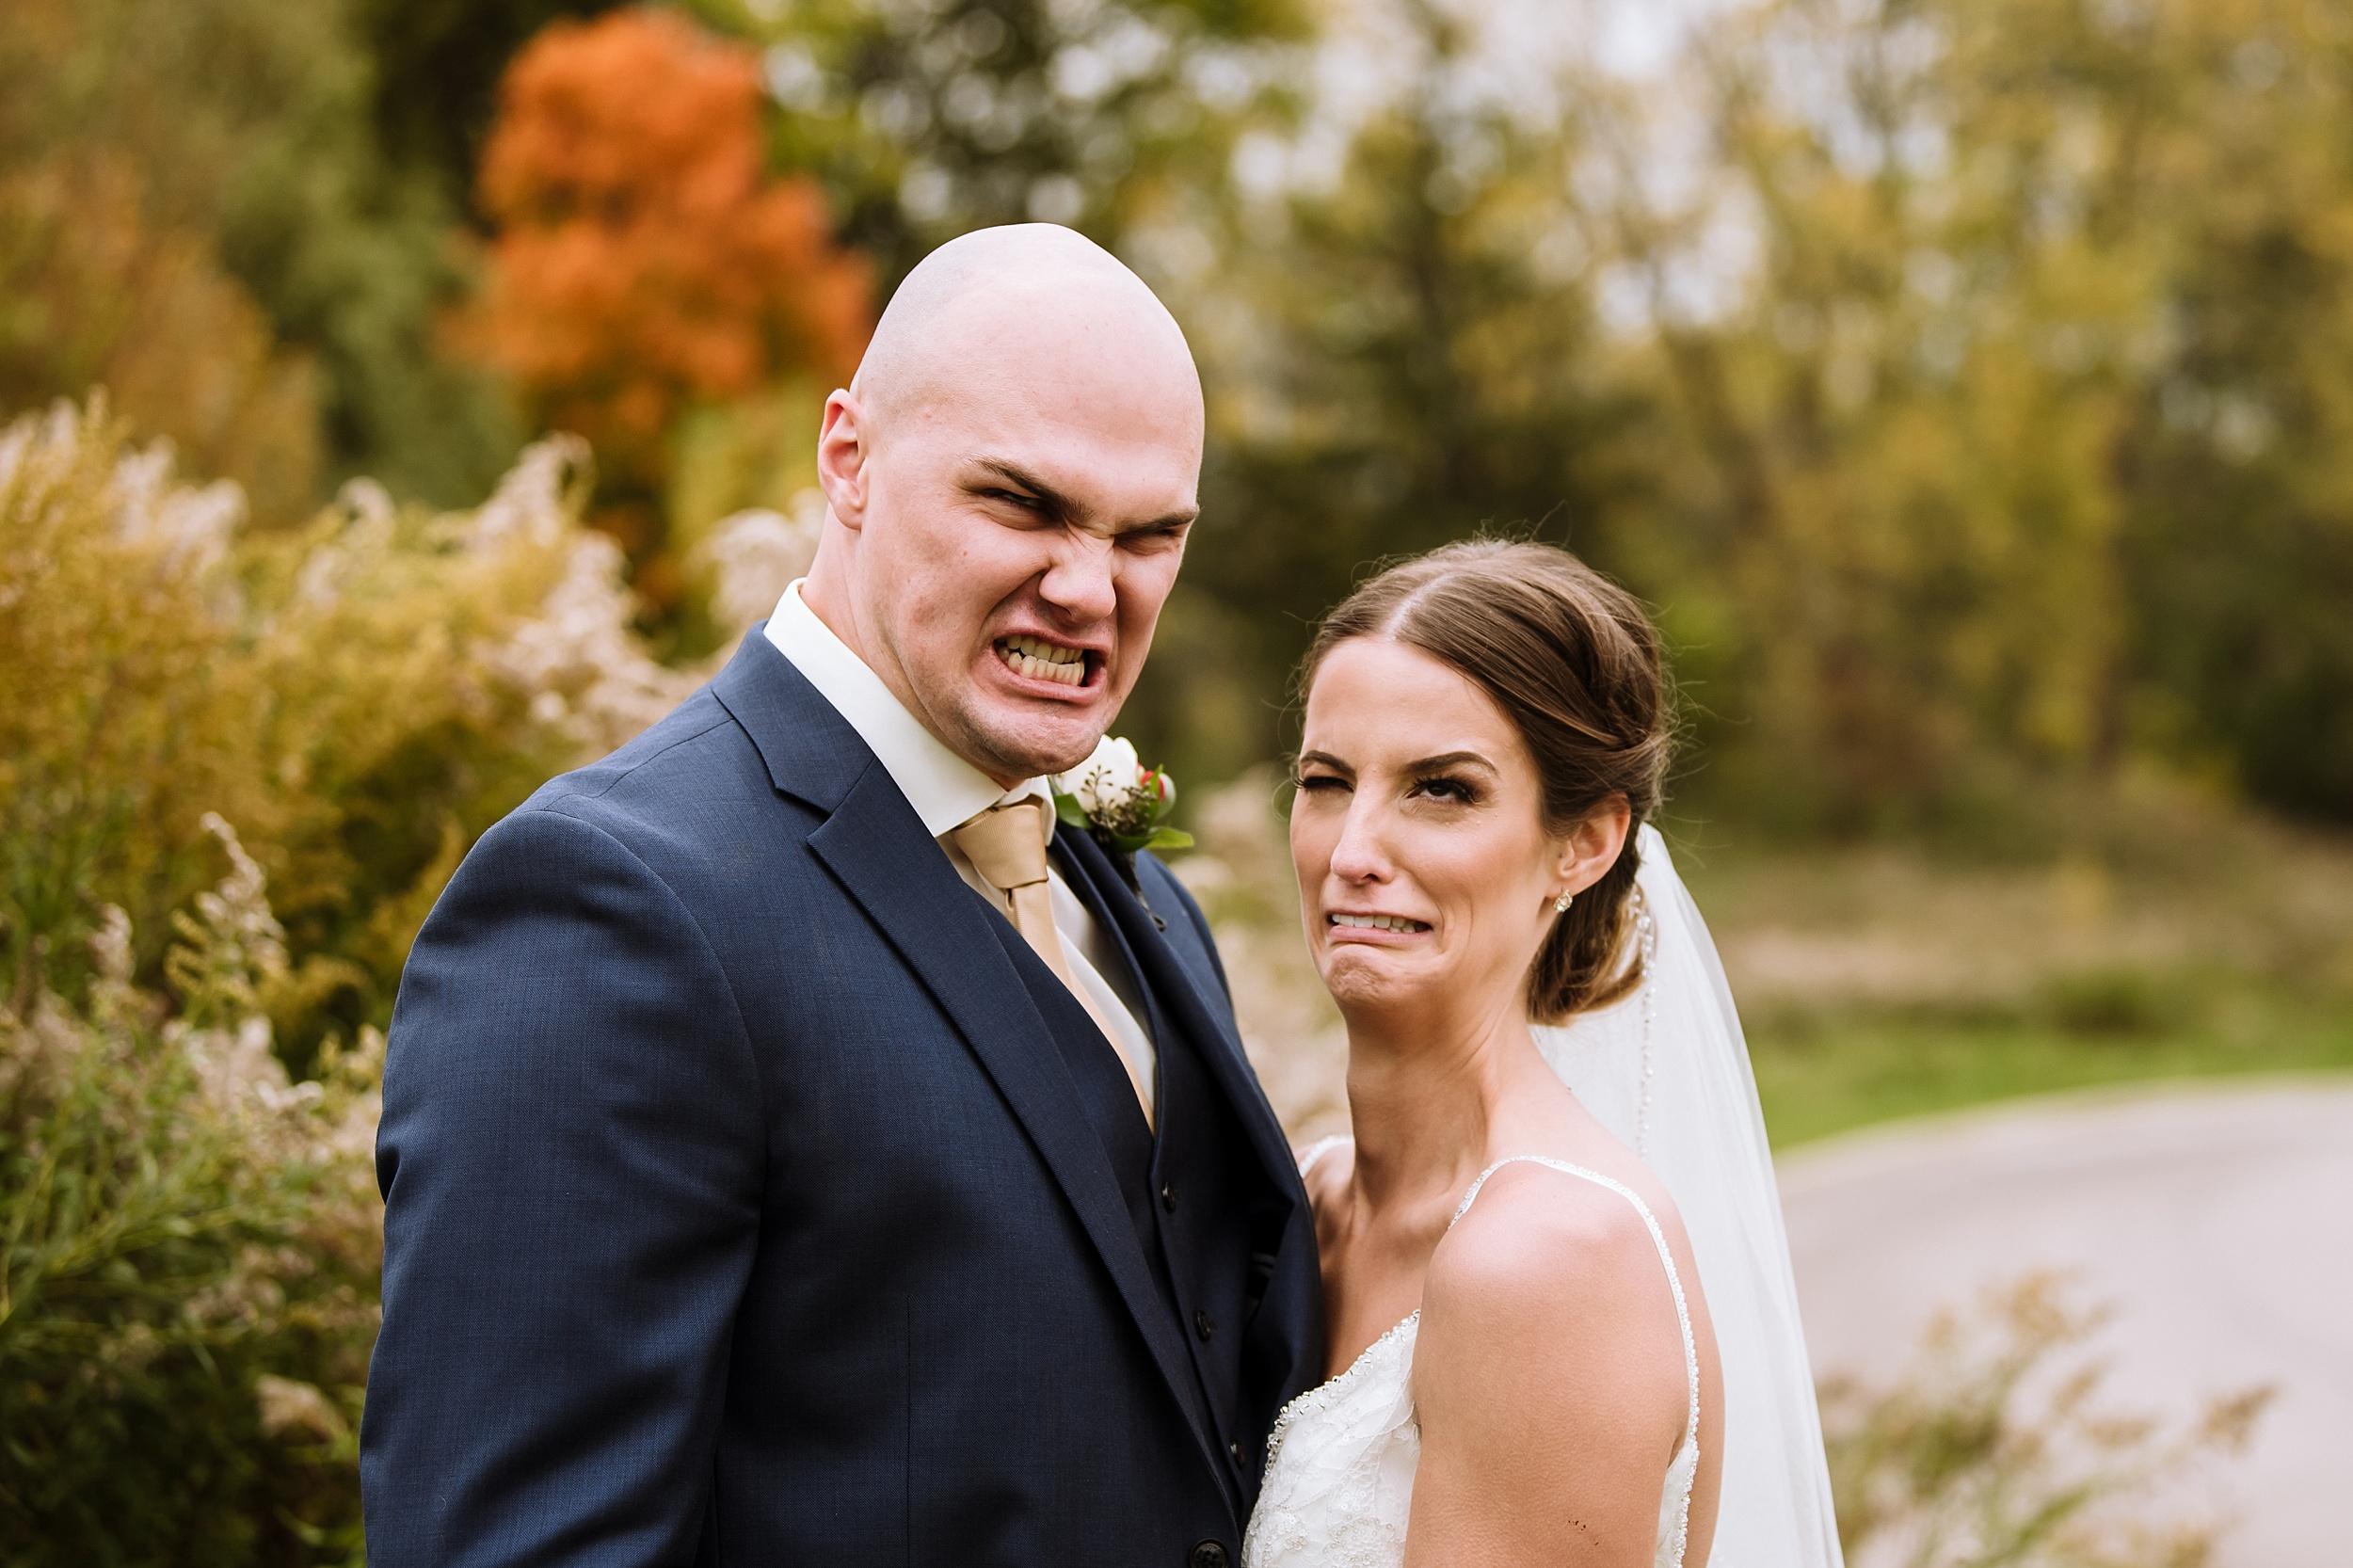 Windemere_Manor_Fall_Wedding_London_Toronto_Wedding_Photographer_0025.jpg